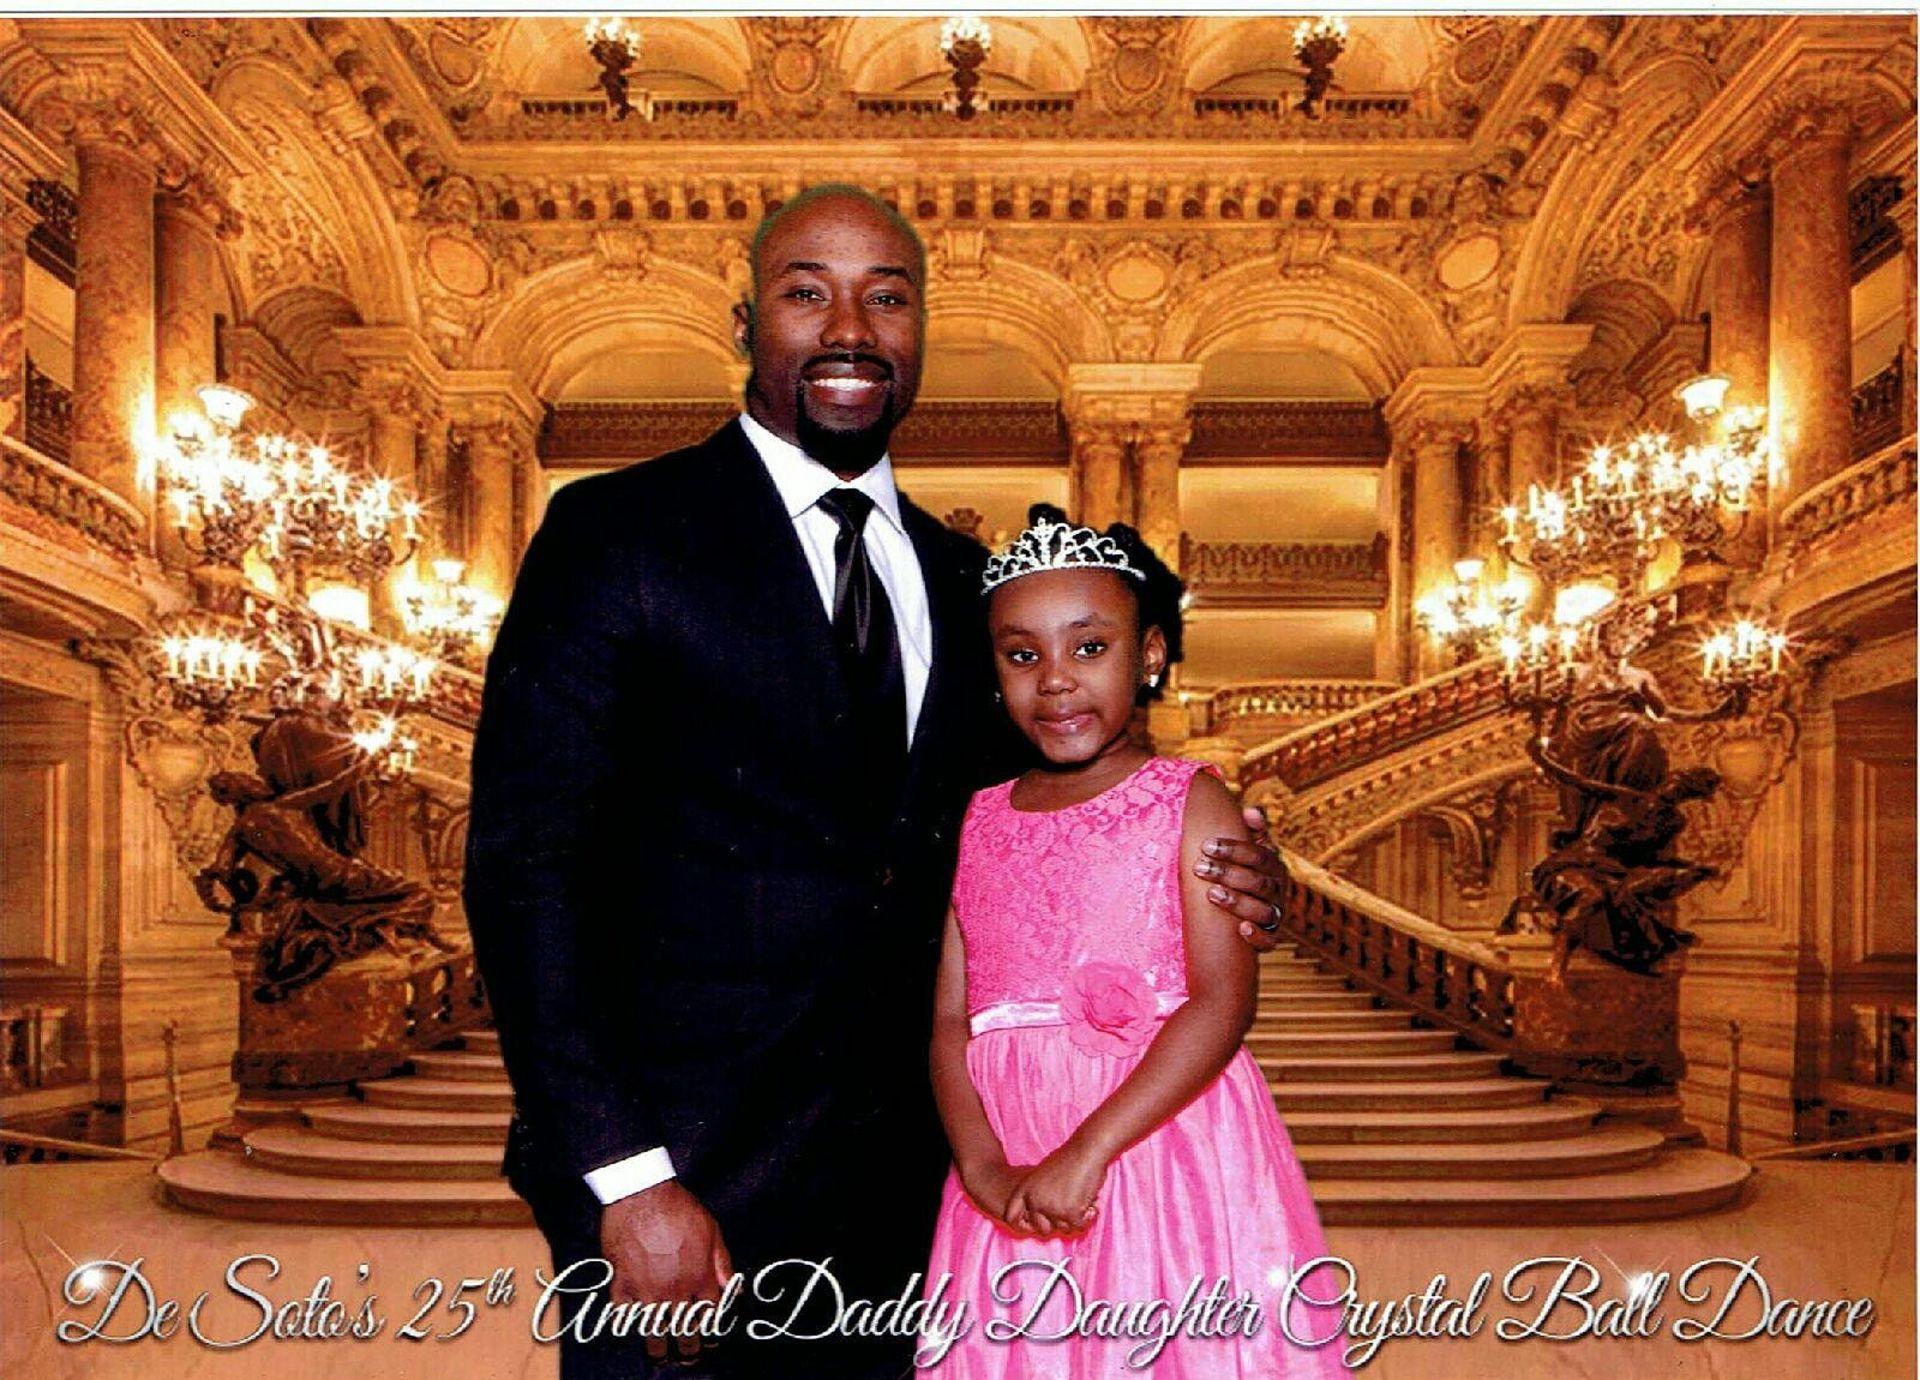 Daddy Daughter Dance in DeSoto Texas